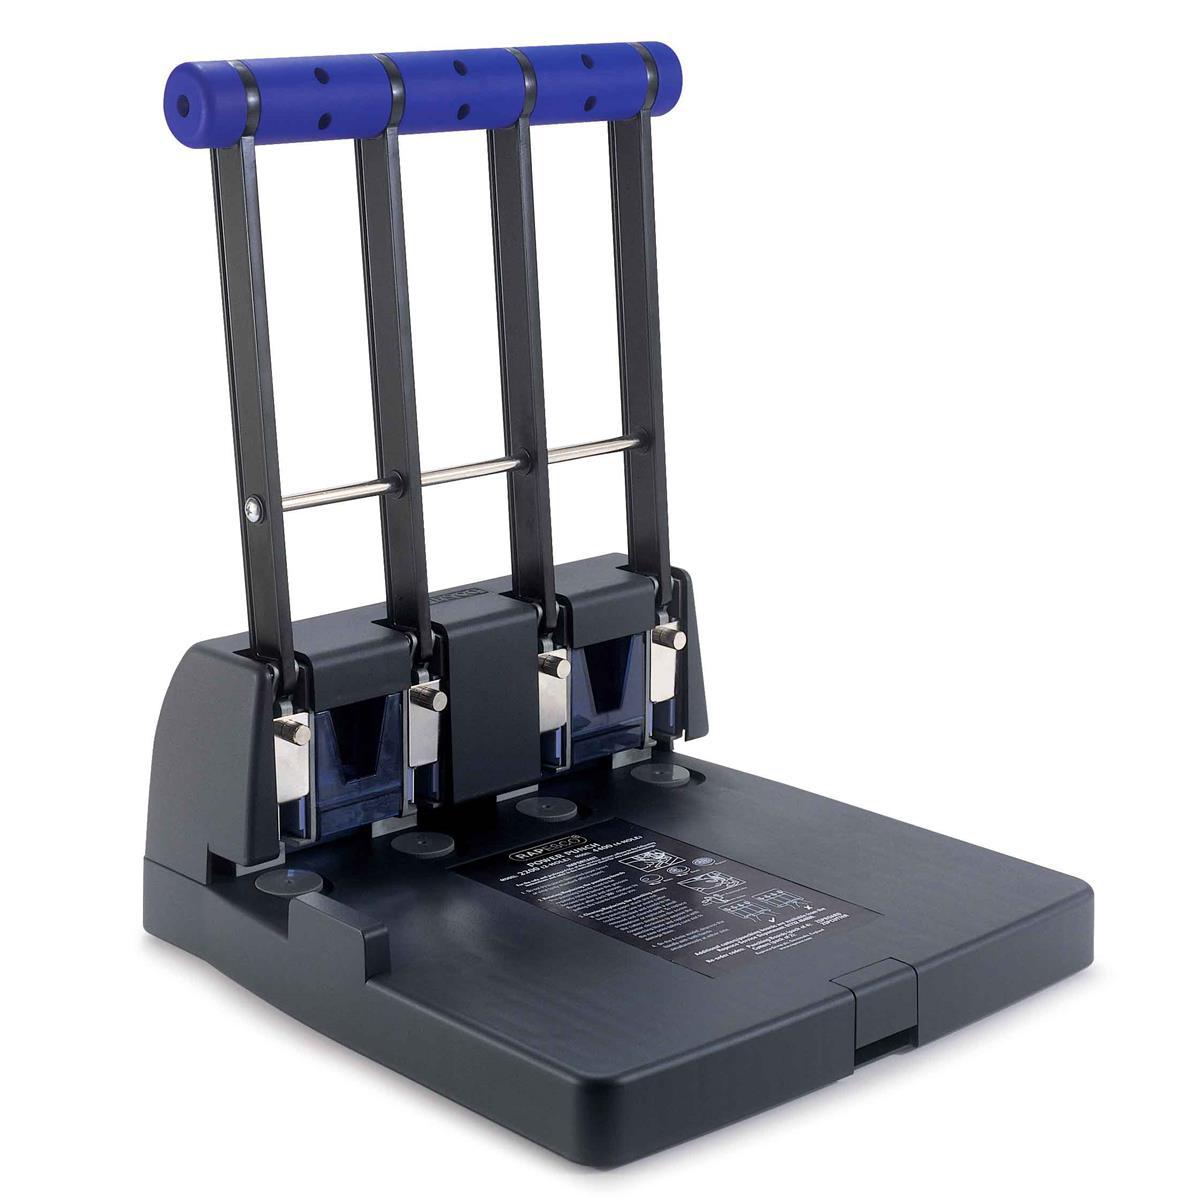 Rapesco ECO 4400 Heavy-duty Punch 4-Hole Capacity 150x 80gsm Black Ref PF4000A1